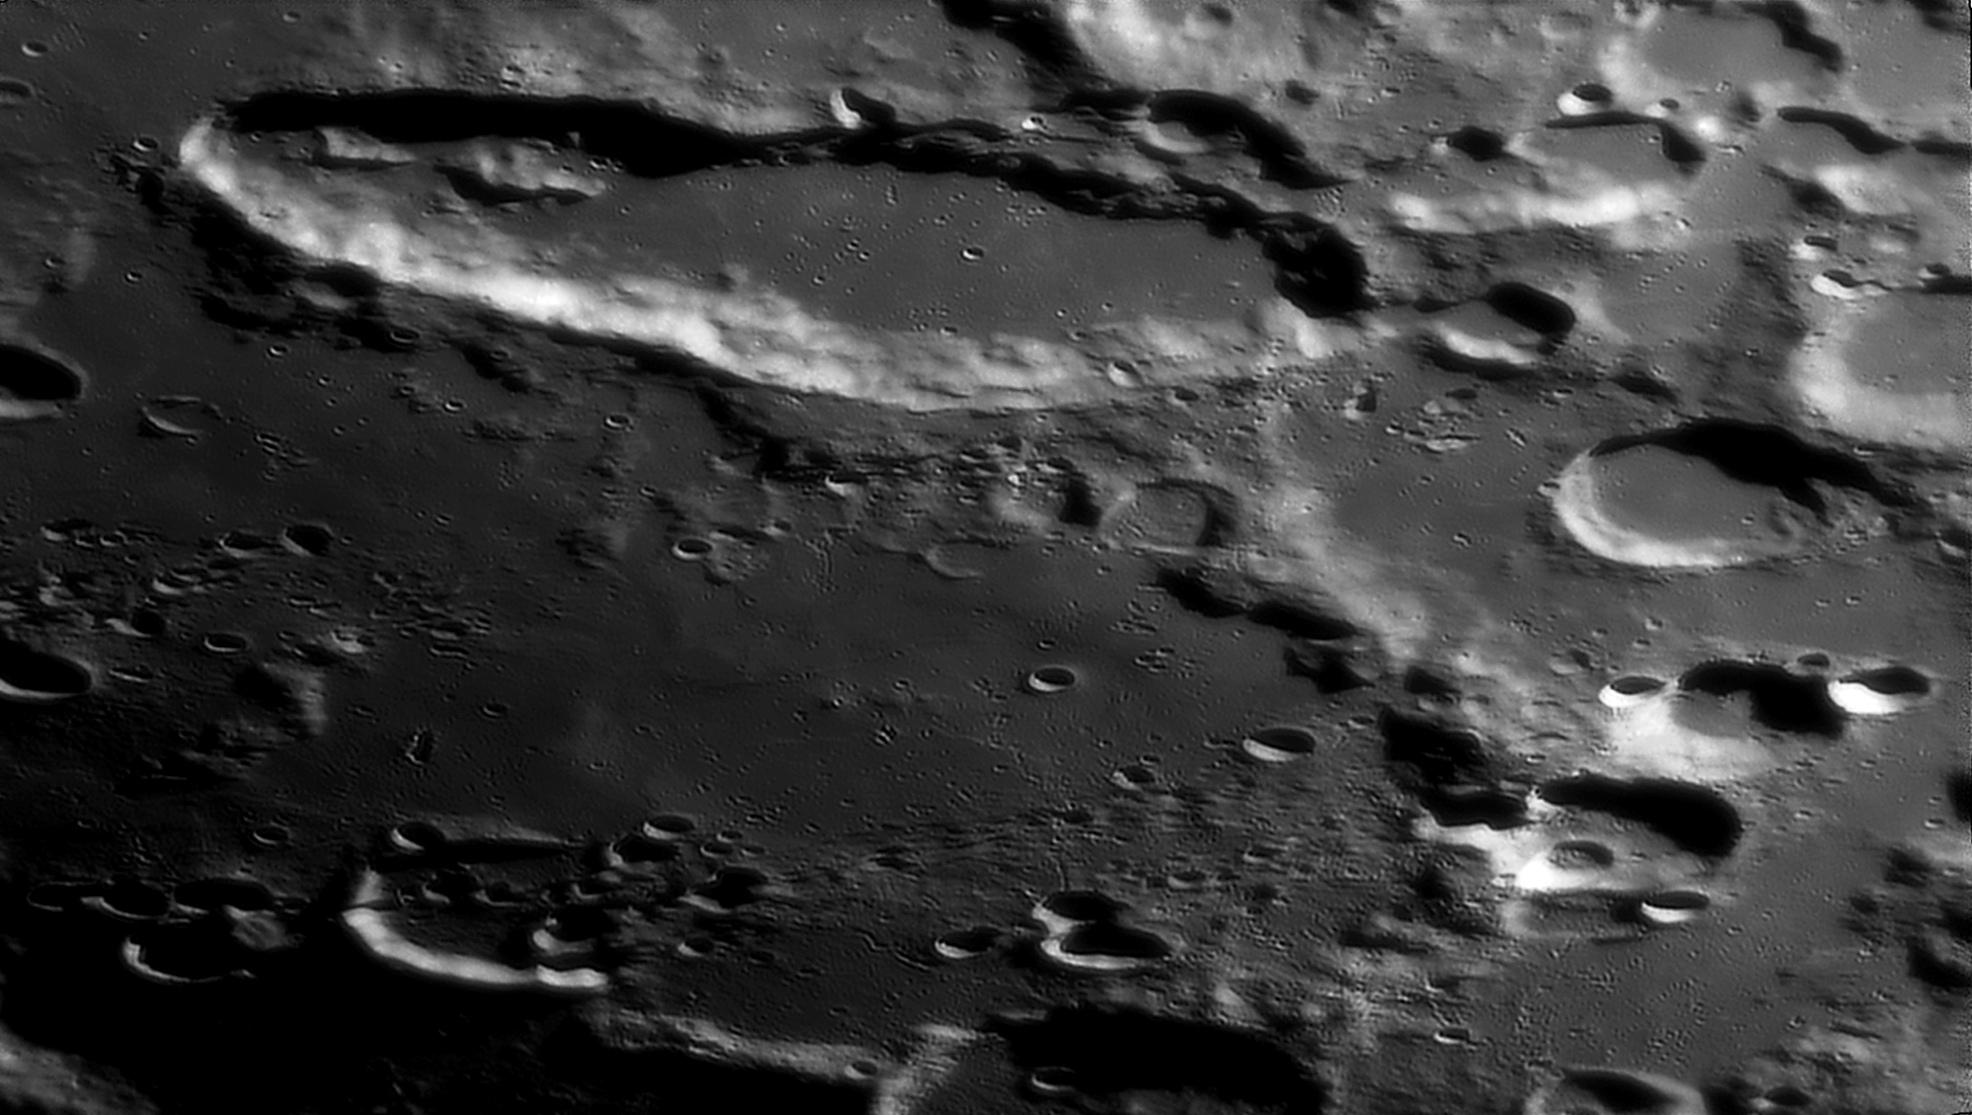 large.2021-02-23-2052_7-R-Moon_TR.jpg.3b7fa2673cc374882df7e3e9bbb92df2.jpg